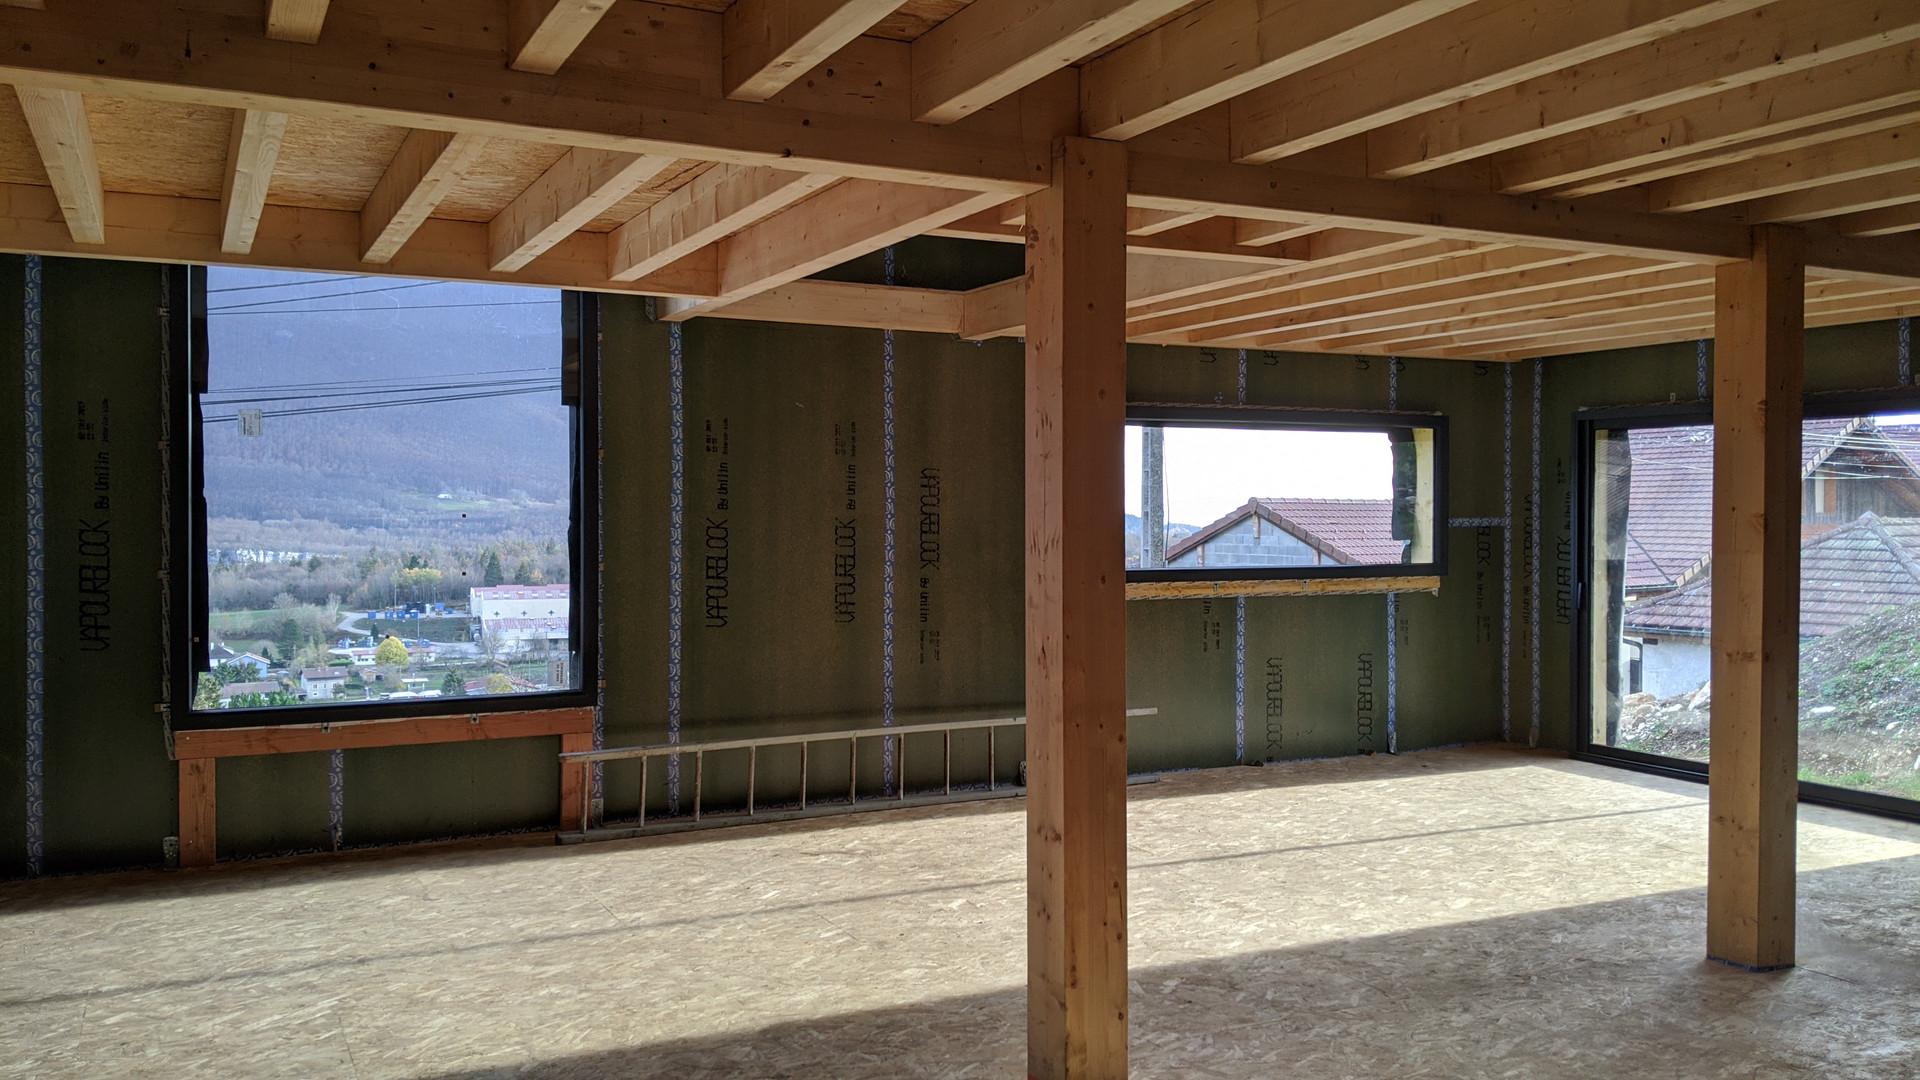 Hirundo-Architecture_Projet B&R_Chantier